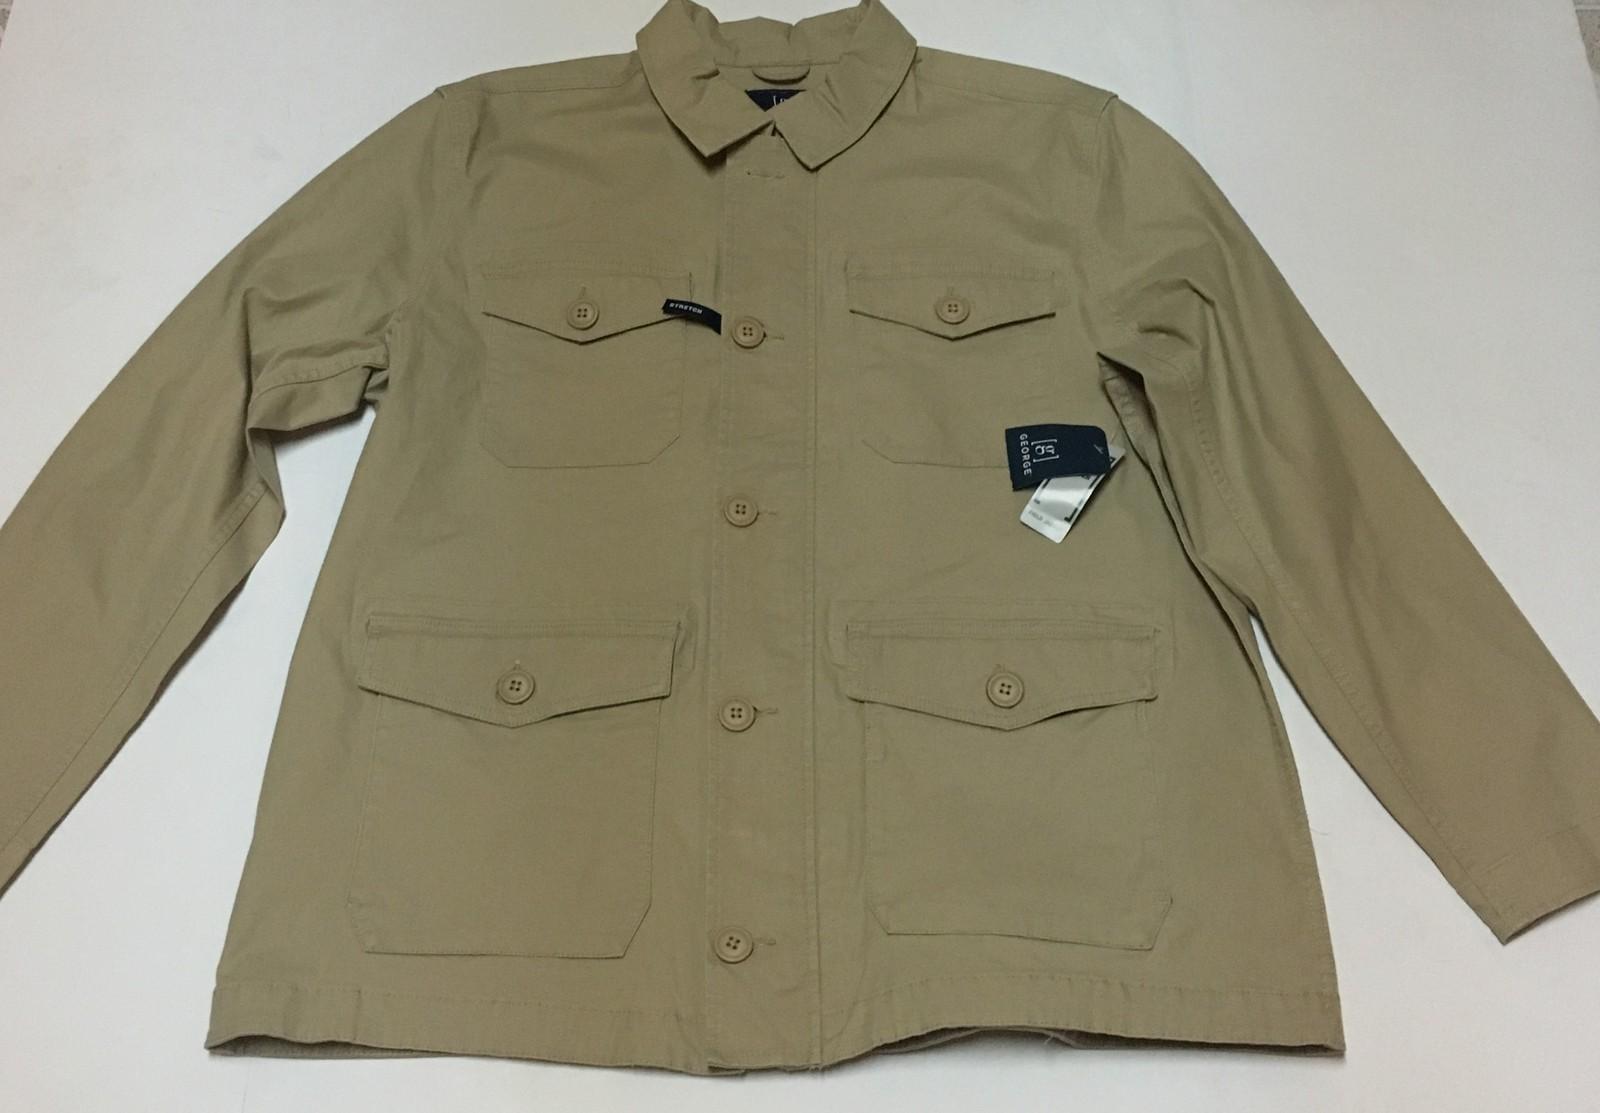 Men's Beige Field Jacket Full Front Zipper Button Down Stretch Sz XL (46-48) NWT